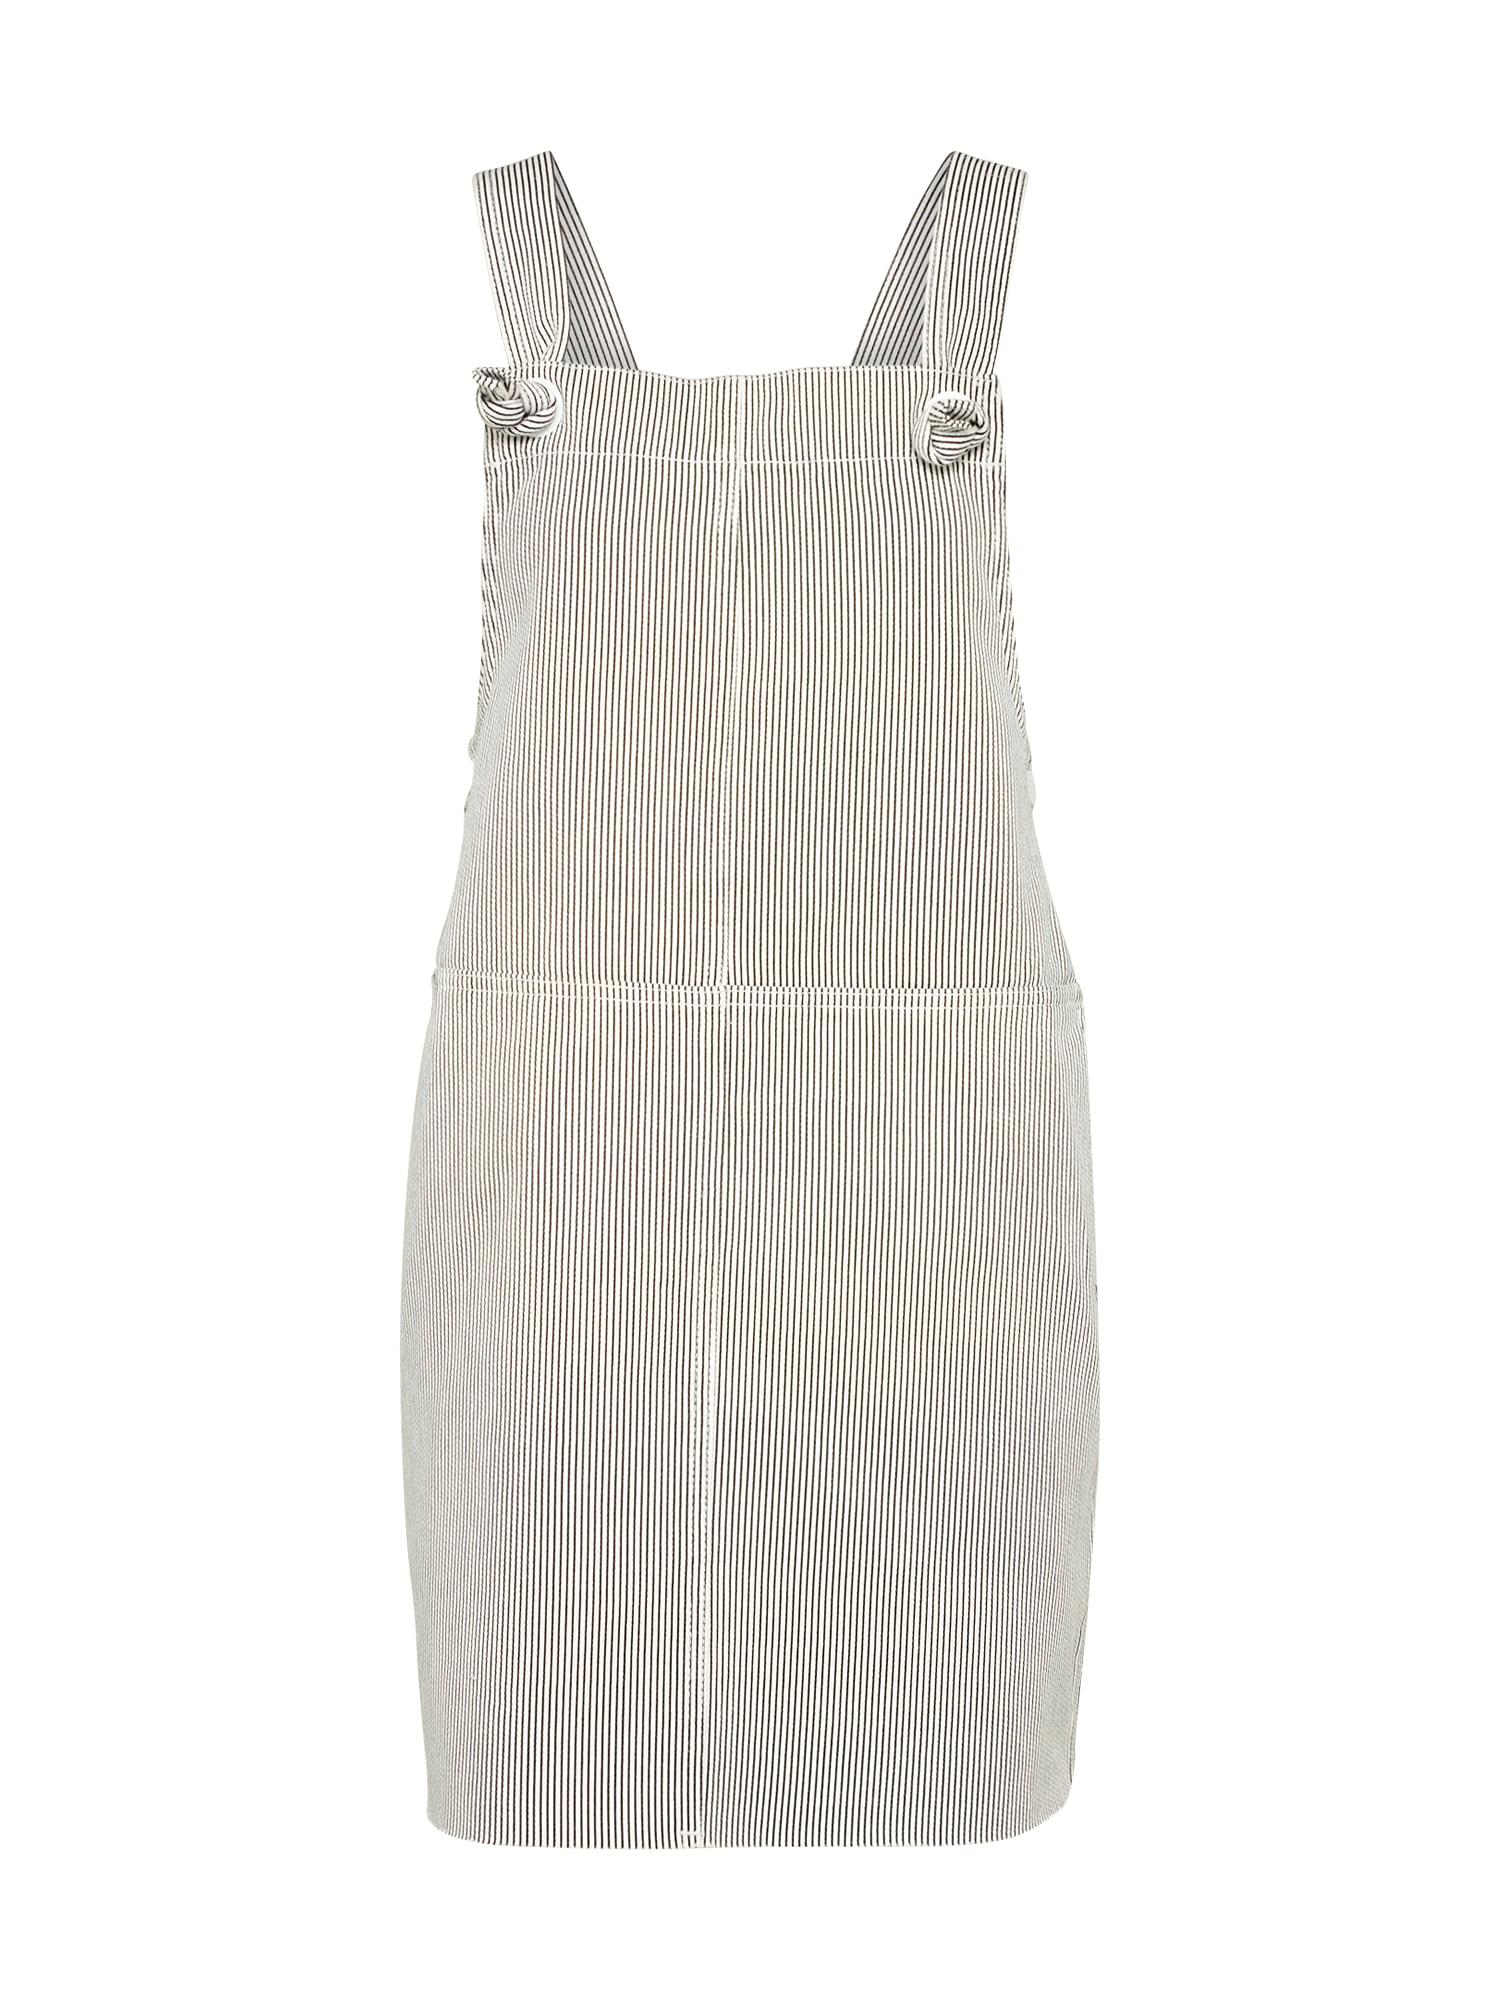 Laclová sukně Thea černá bílá EDITED